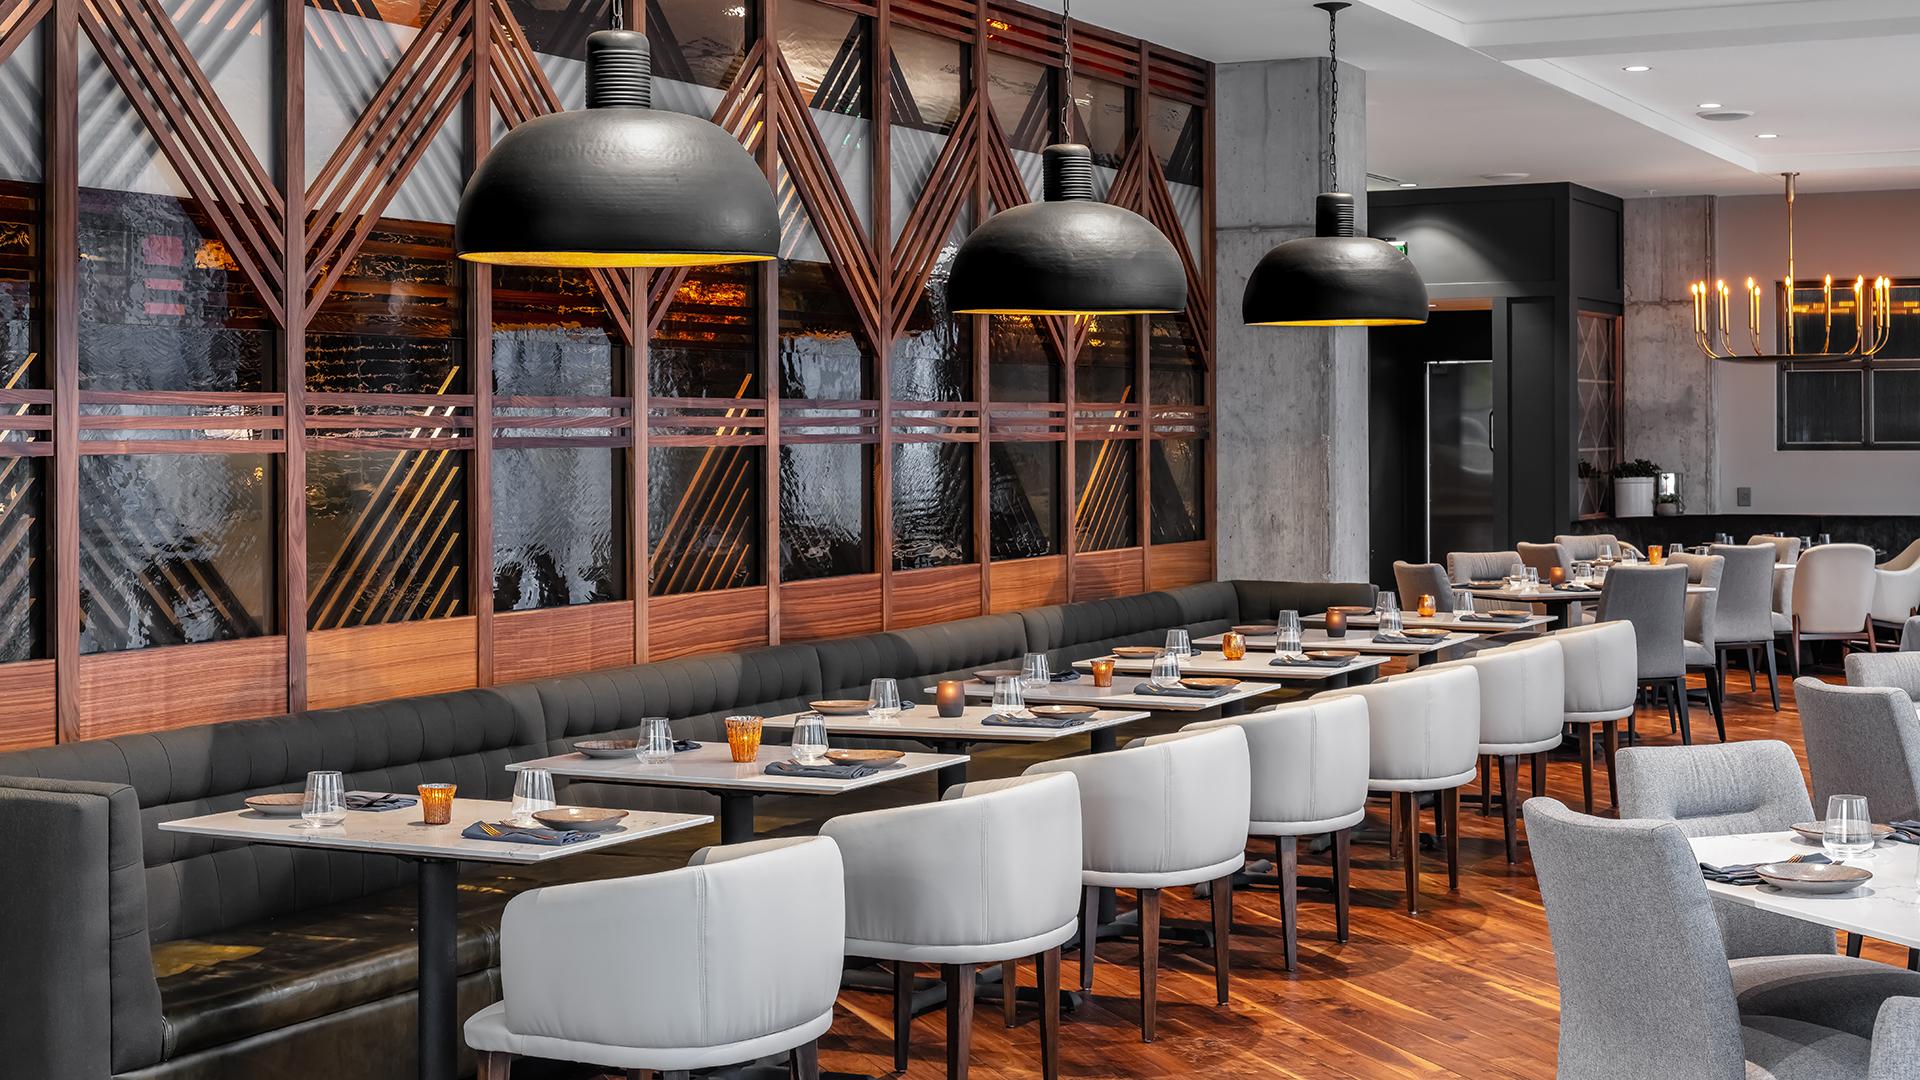 Elliot Park Hotel Tavola restaurant